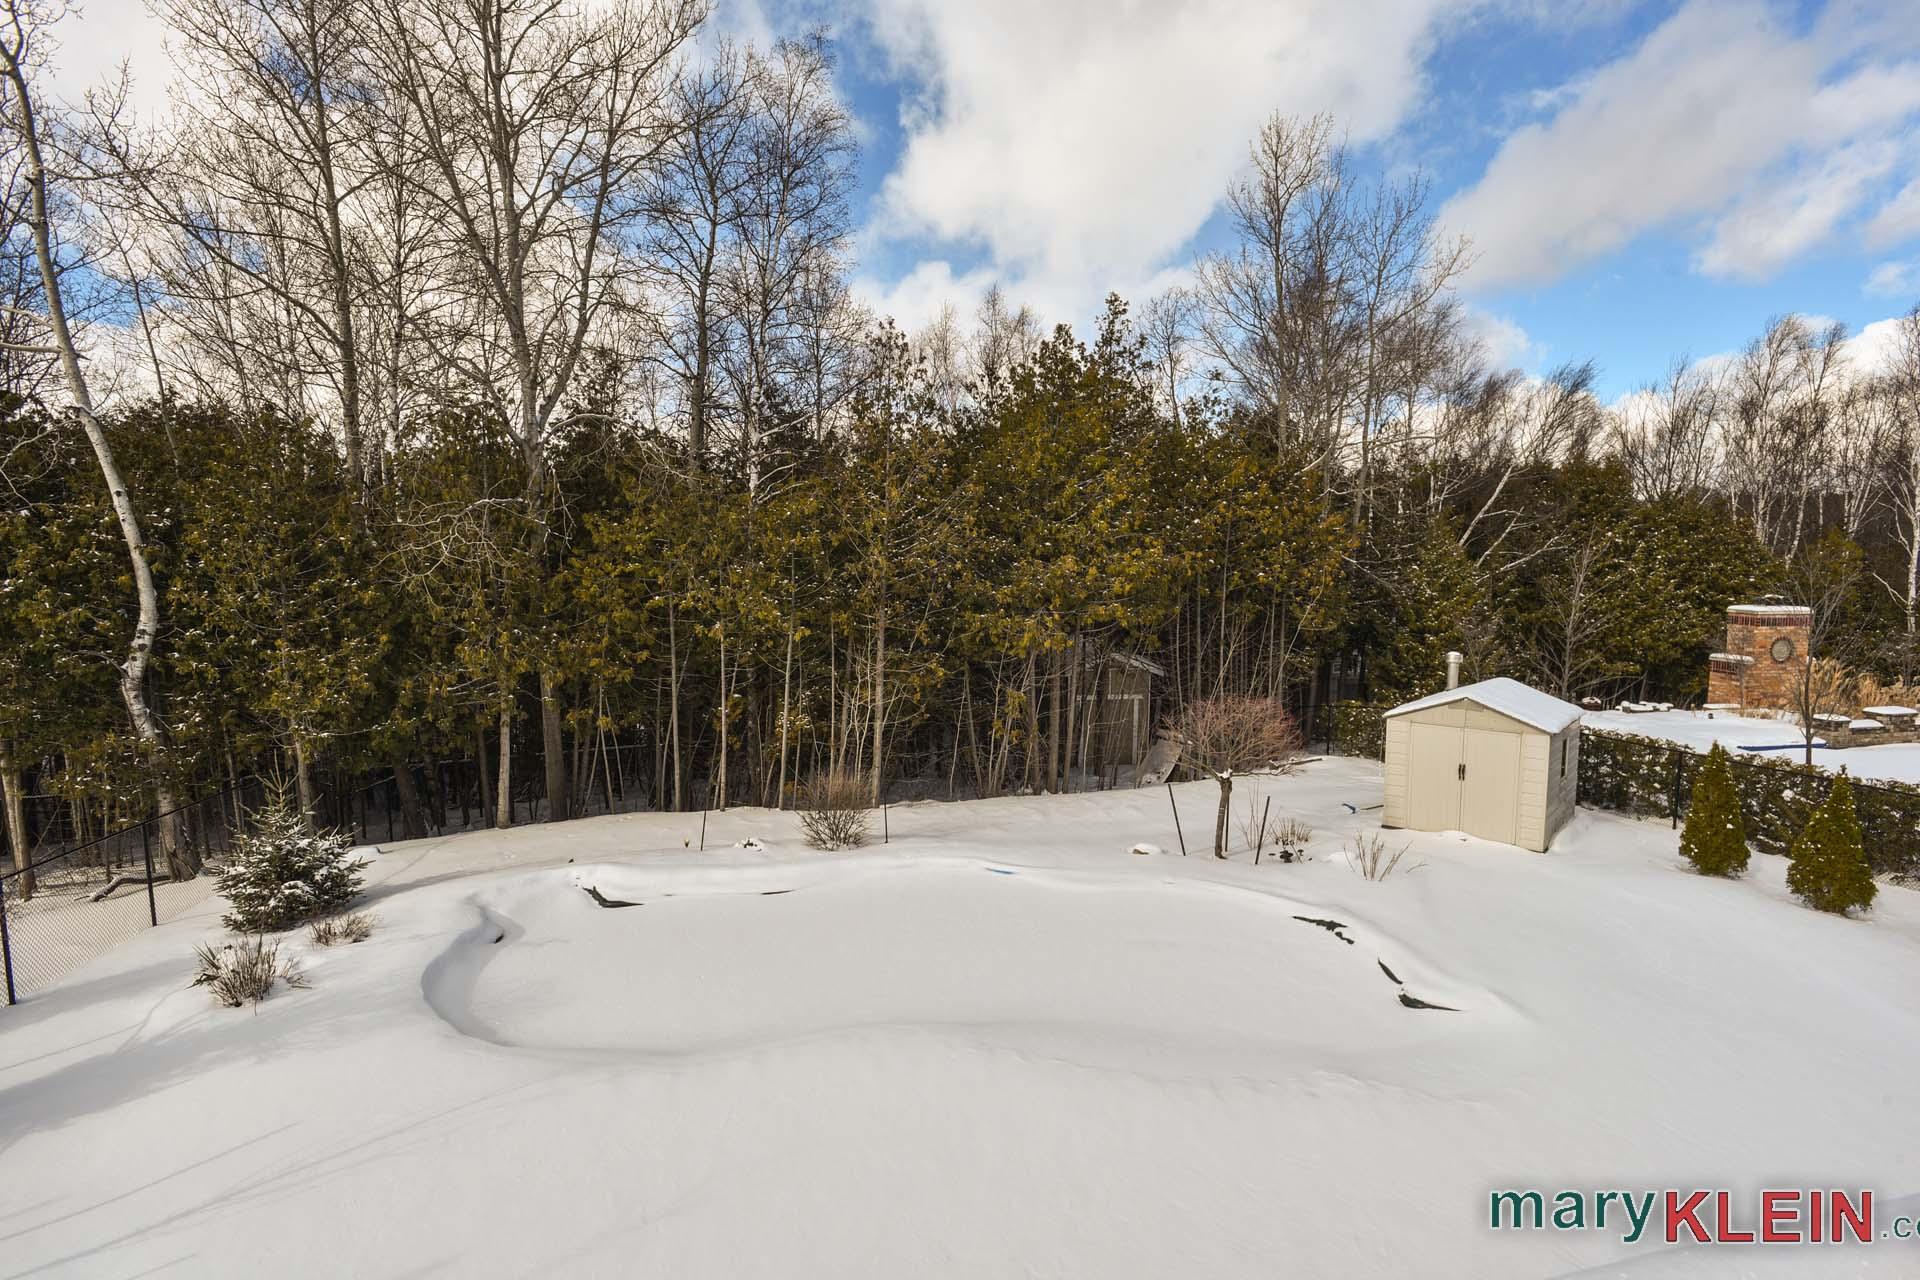 Backyard, winter